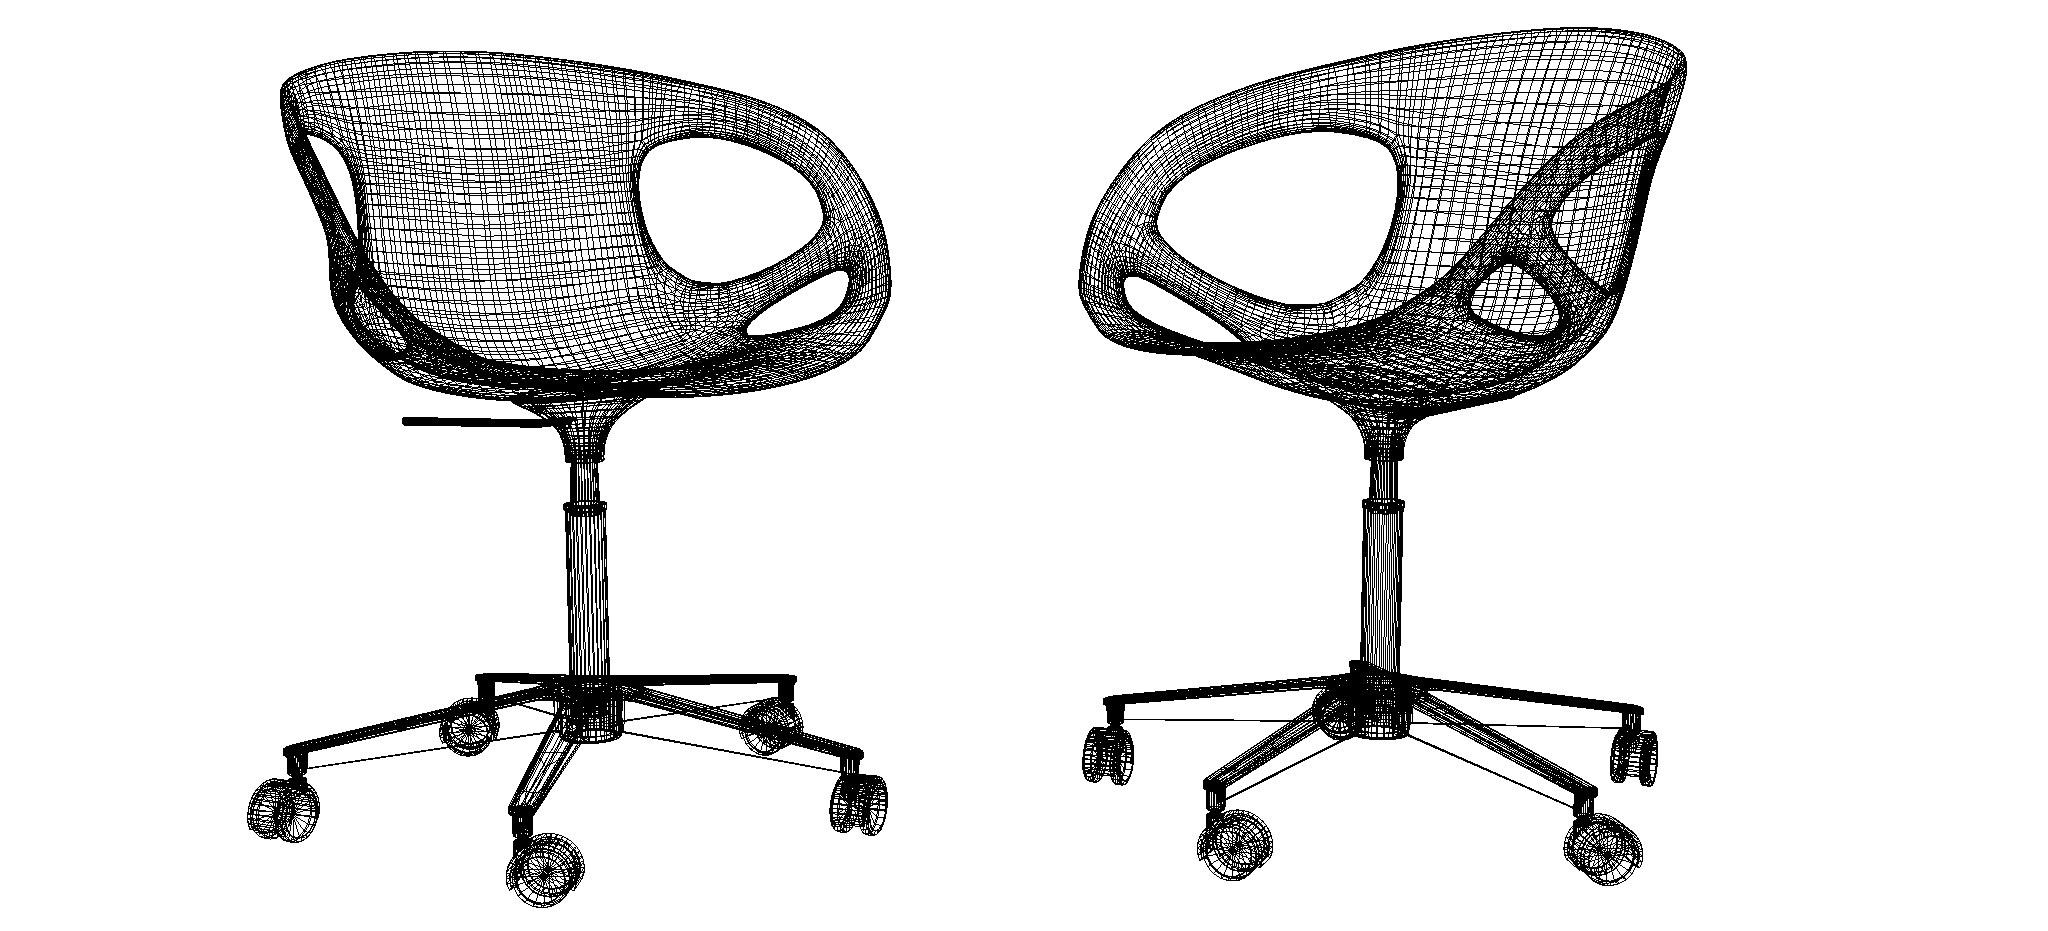 chair design parameters adirondack cake topper rin office 3d model max obj 3ds fbx dxf dwg